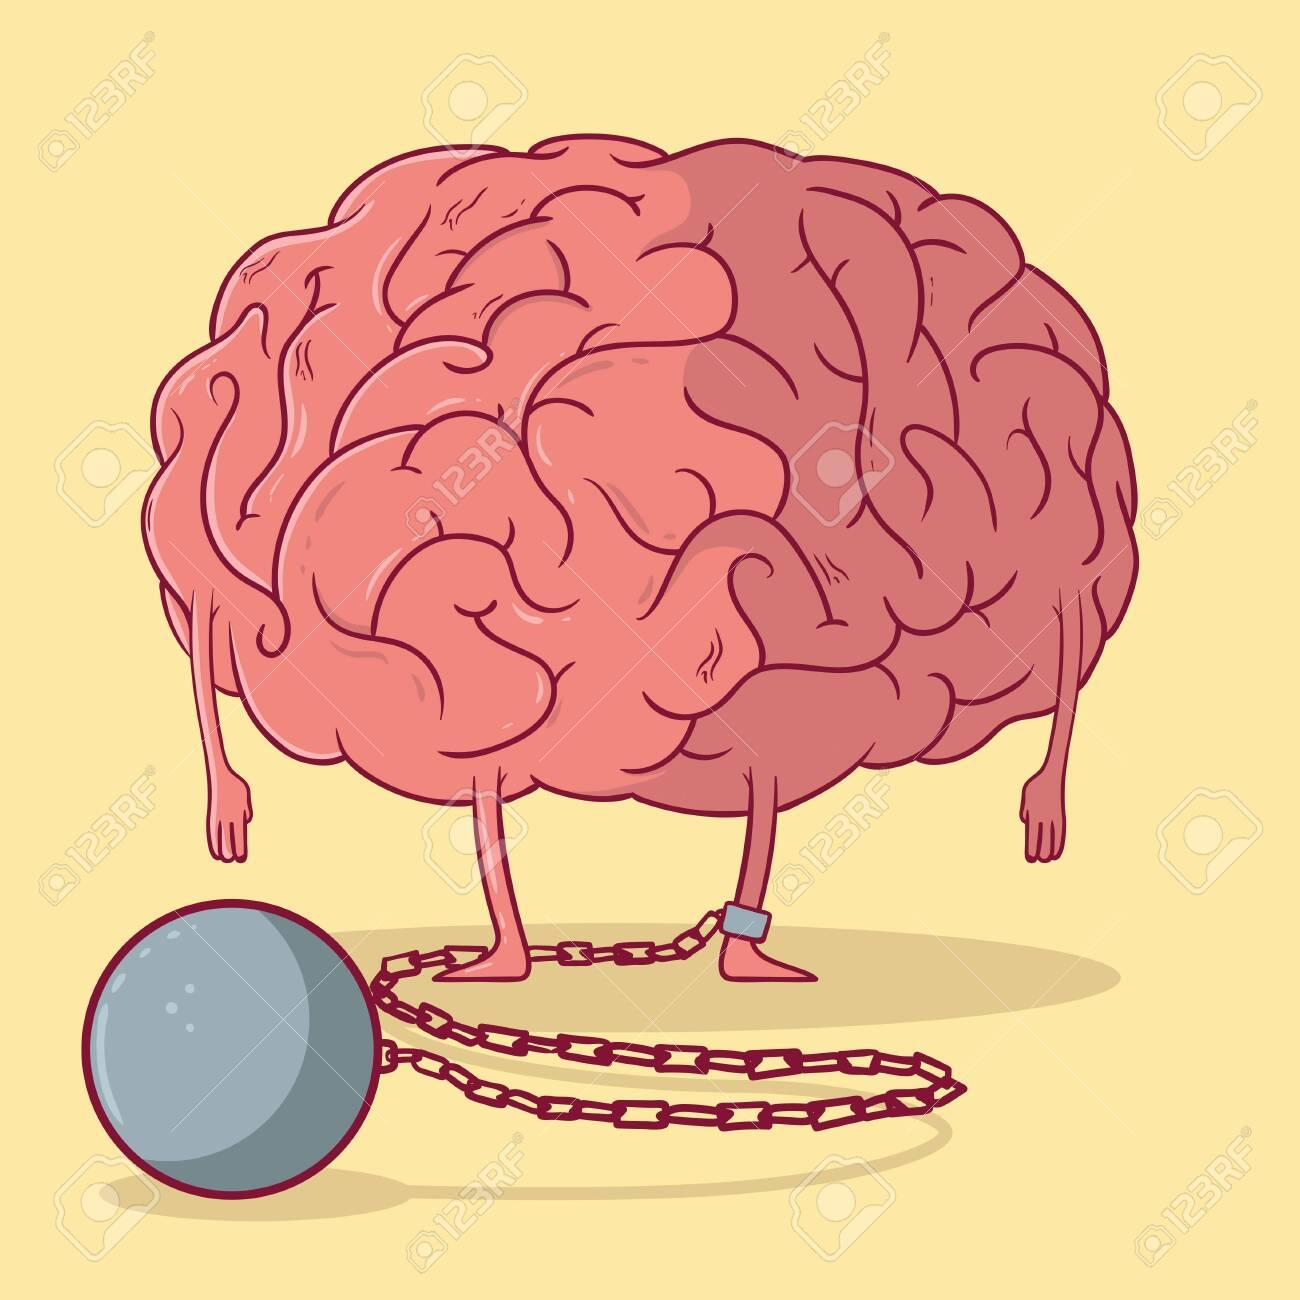 Brain stuck to a ball chain vector illustration. Mind, Brain, imagination design concept - 136757616